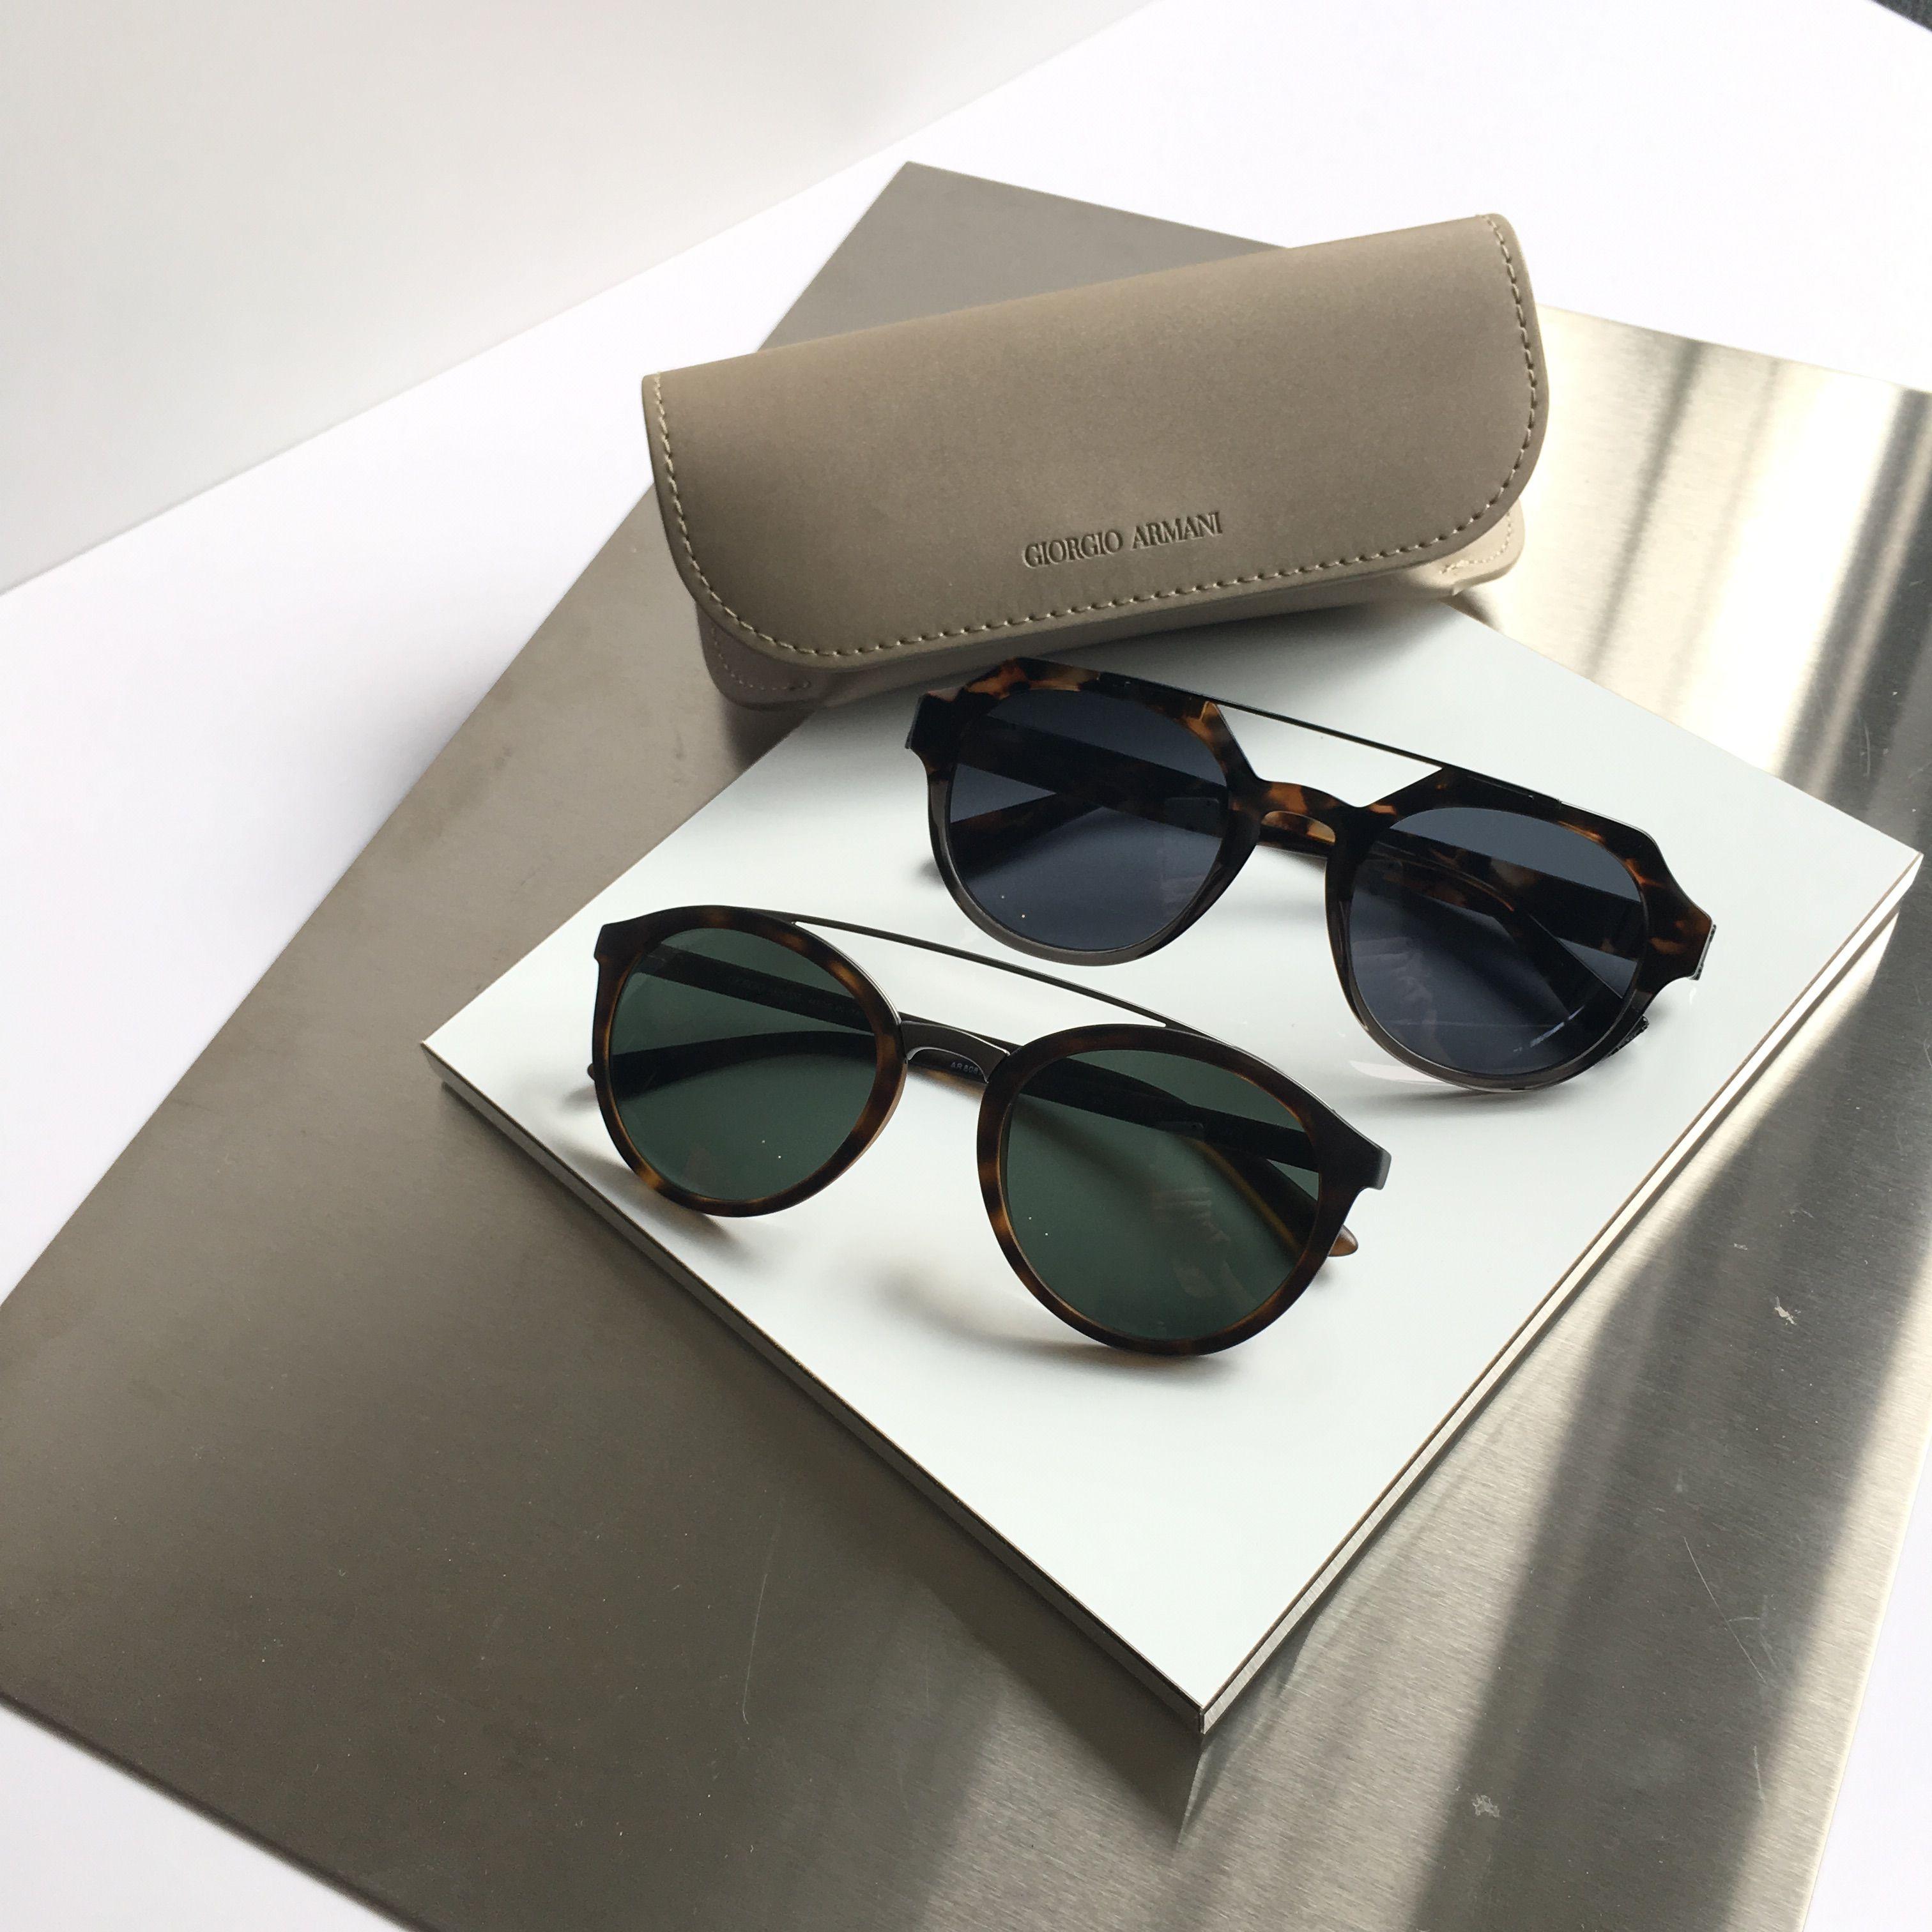 3db11ce51c D&G - Dolce&Gabbana Fashionable eyewear for men and woman ...